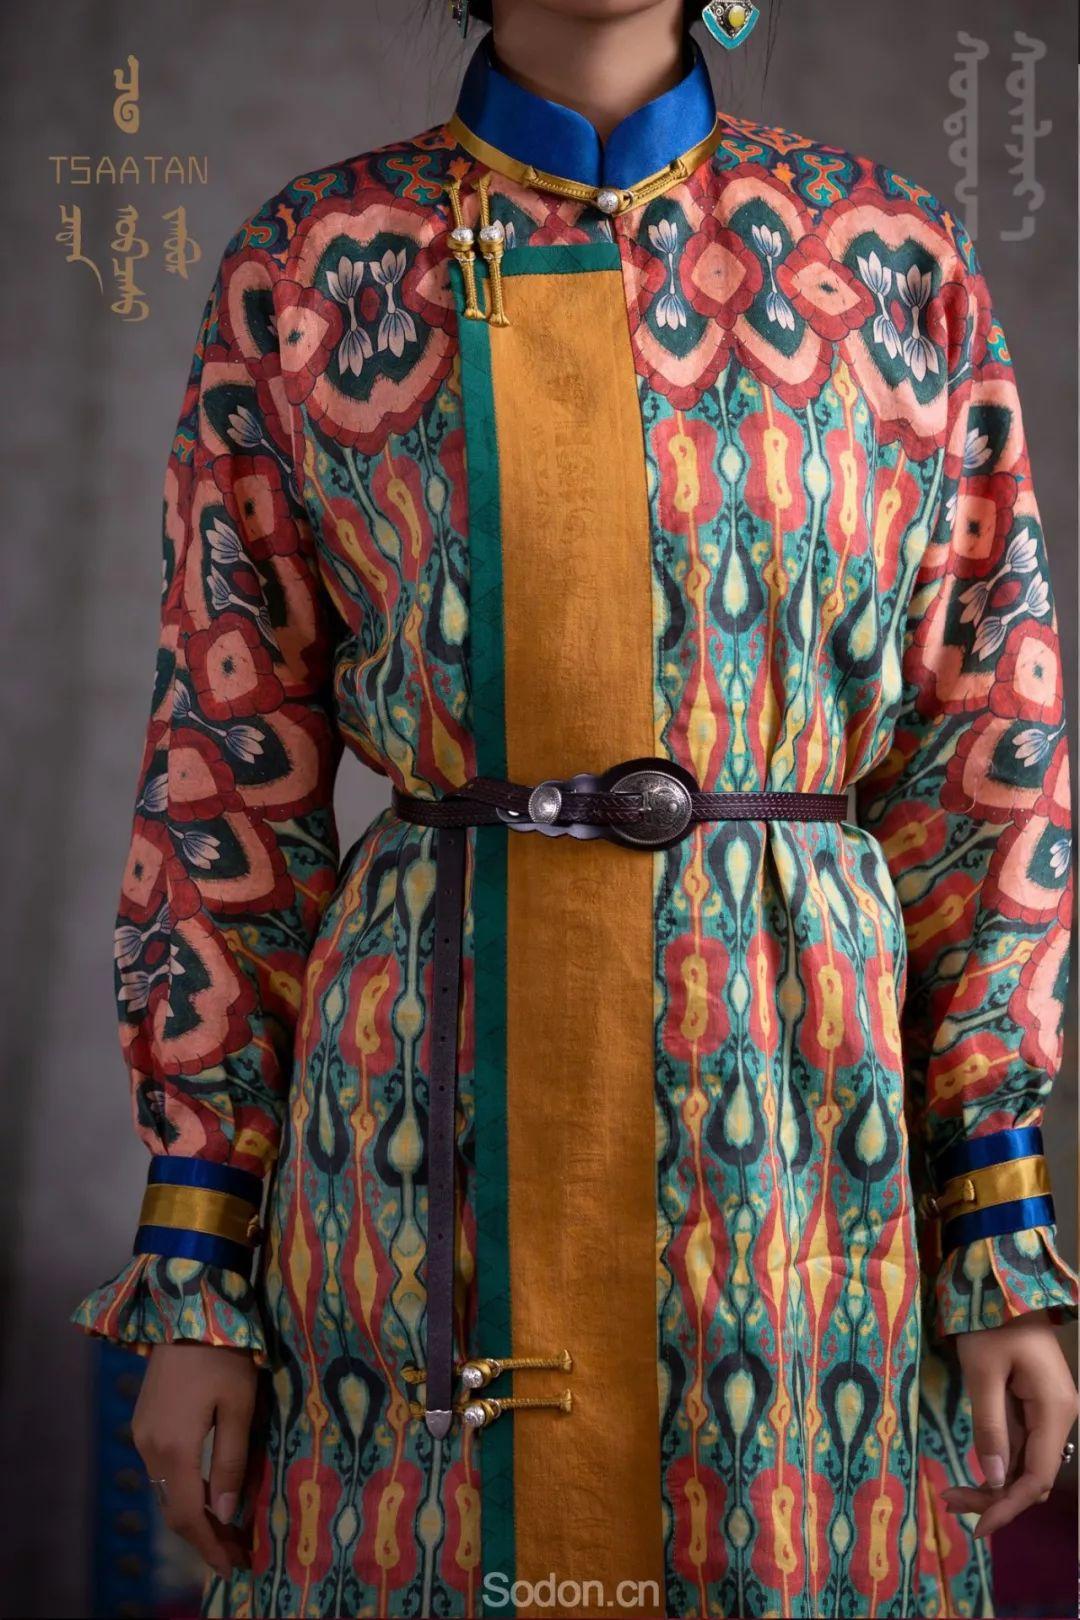 TSAATAN蒙古时装秋冬系列,来自驯鹿人的独特魅力! 第32张